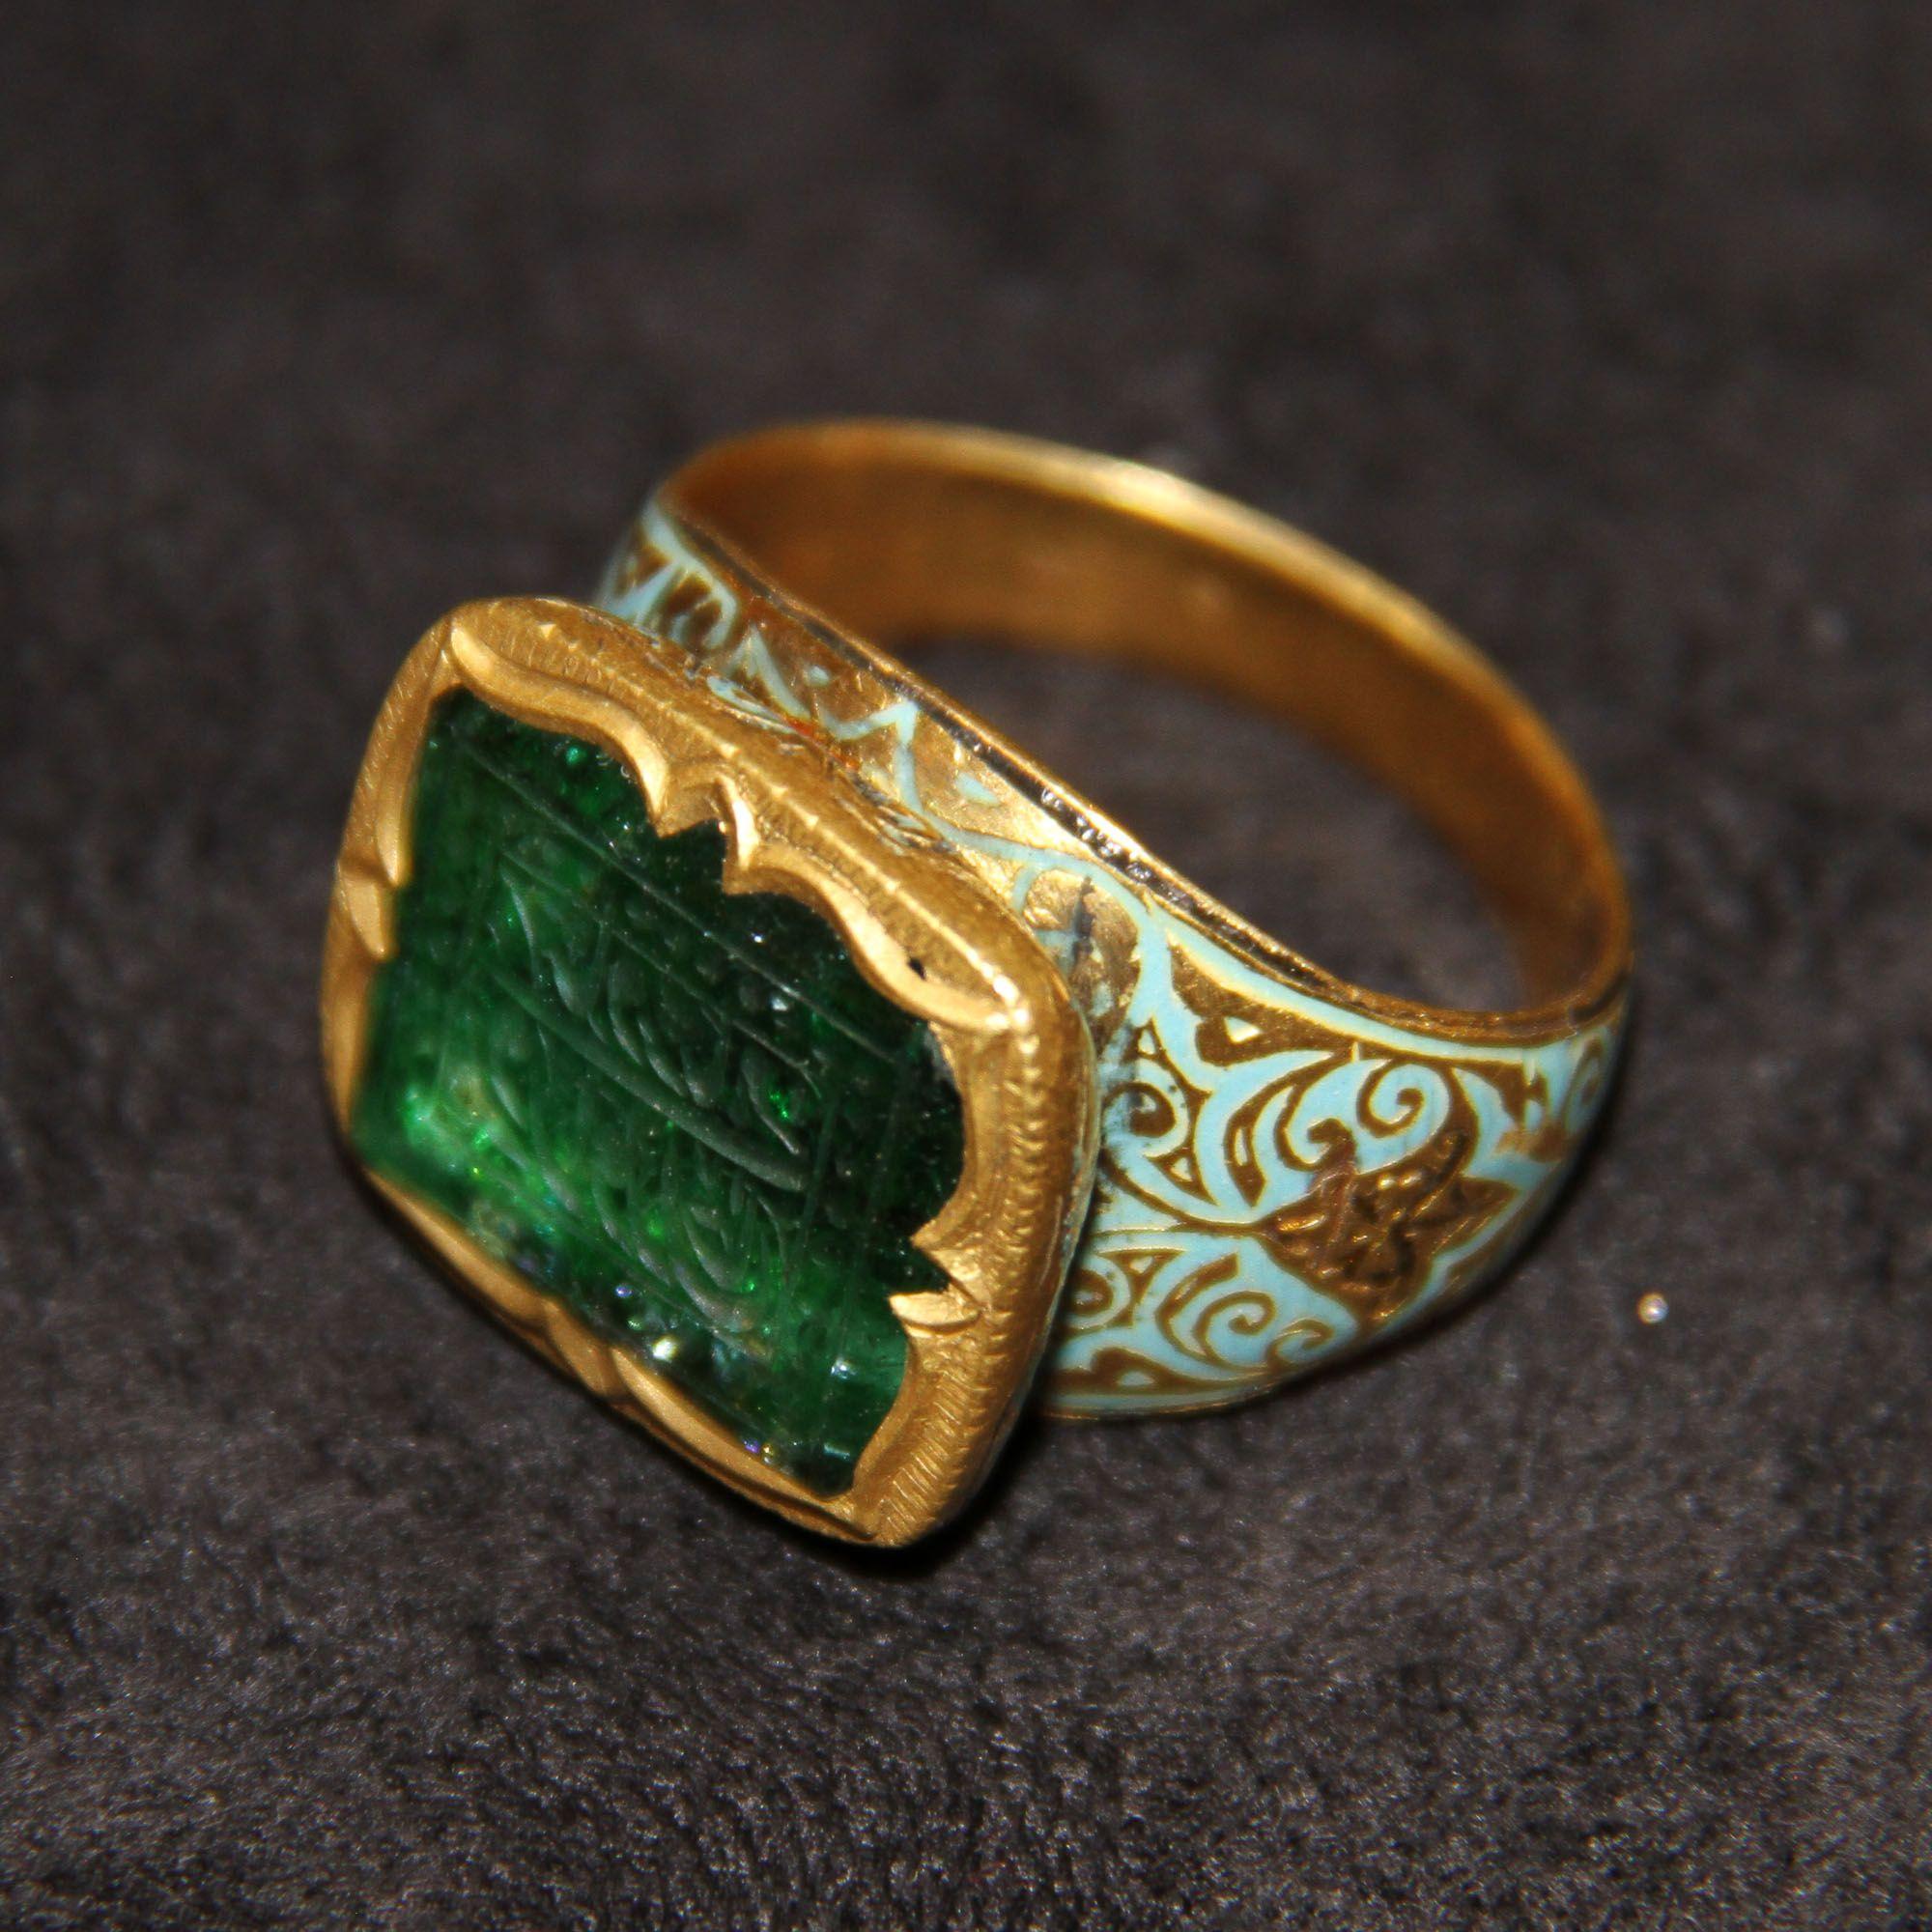 jewelry a mughal emerald islamic calligraphy ring the